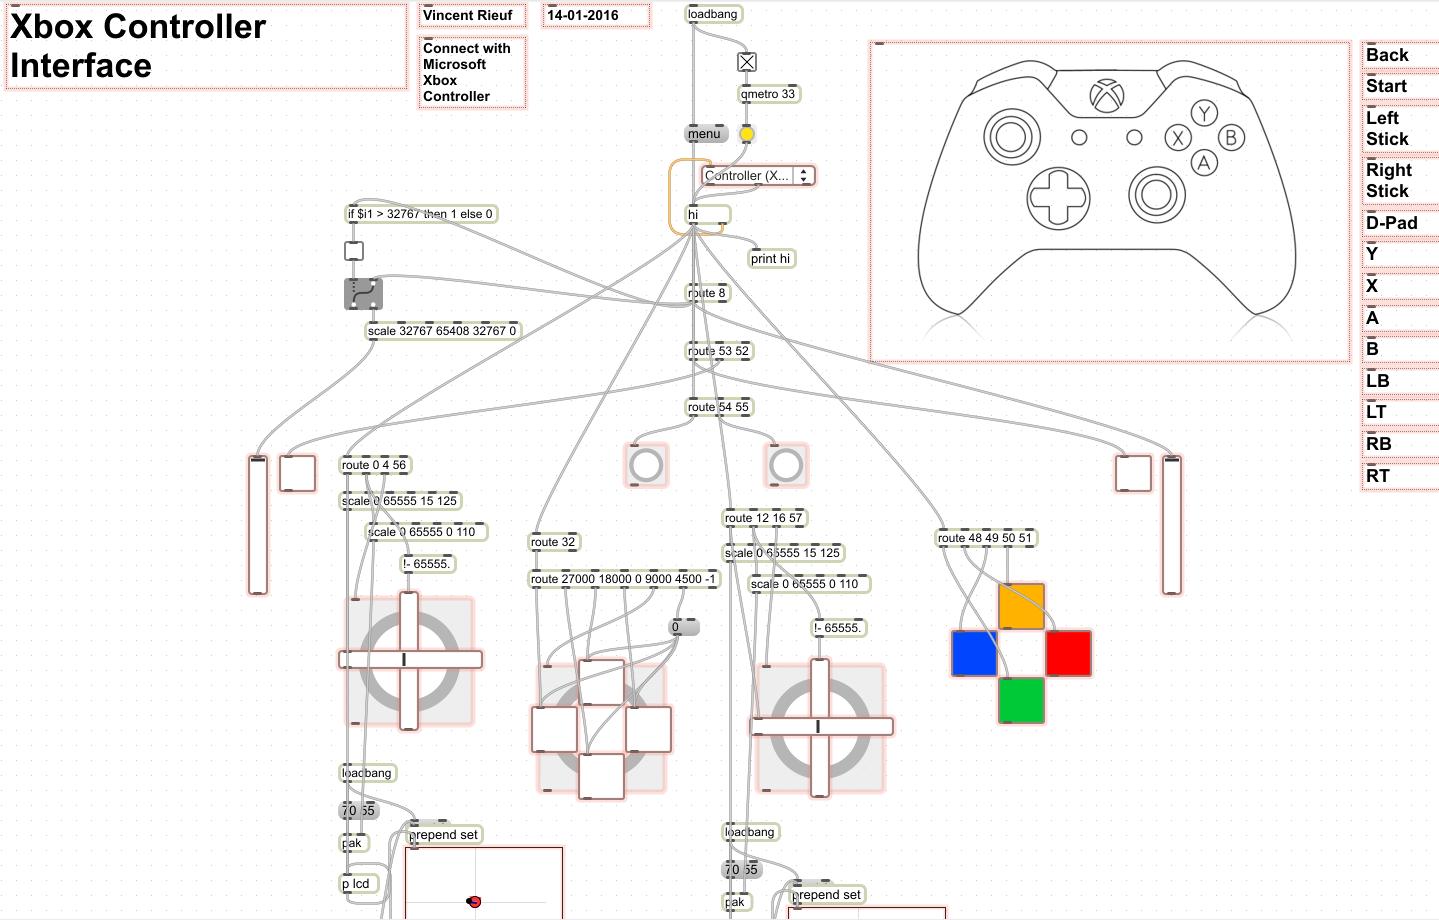 xbox controller schematic house wiring diagram symbols \u2022 xbox 360 slim power supply schematic tool xbox controller interface cycling 74 rh cycling74 com original xbox controller schematic original xbox controller schematic